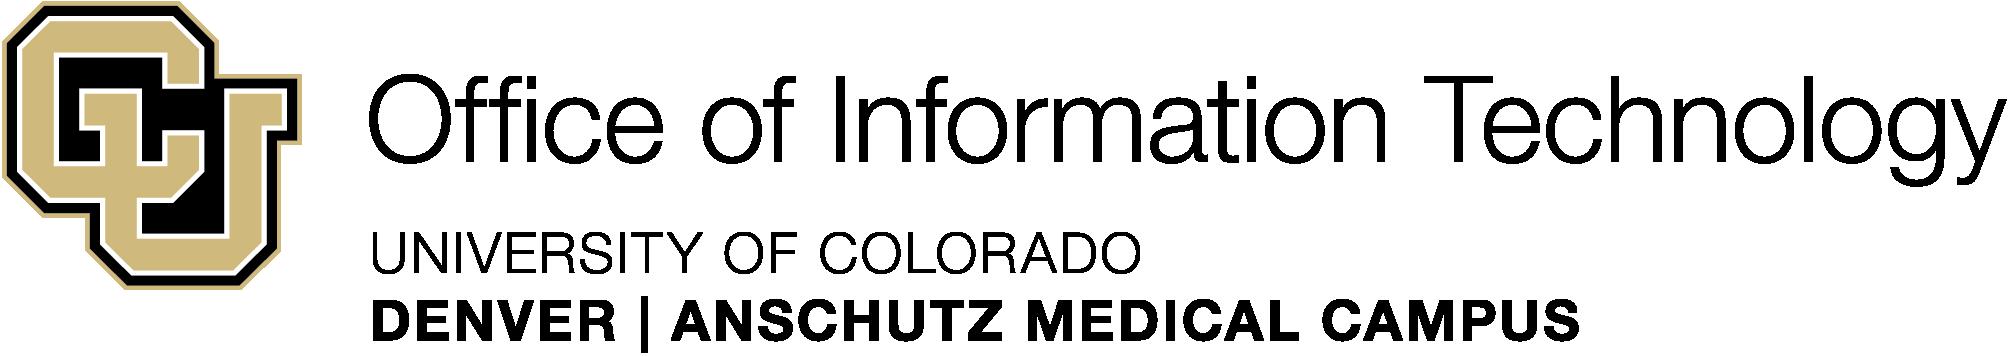 OIT dual campus logo